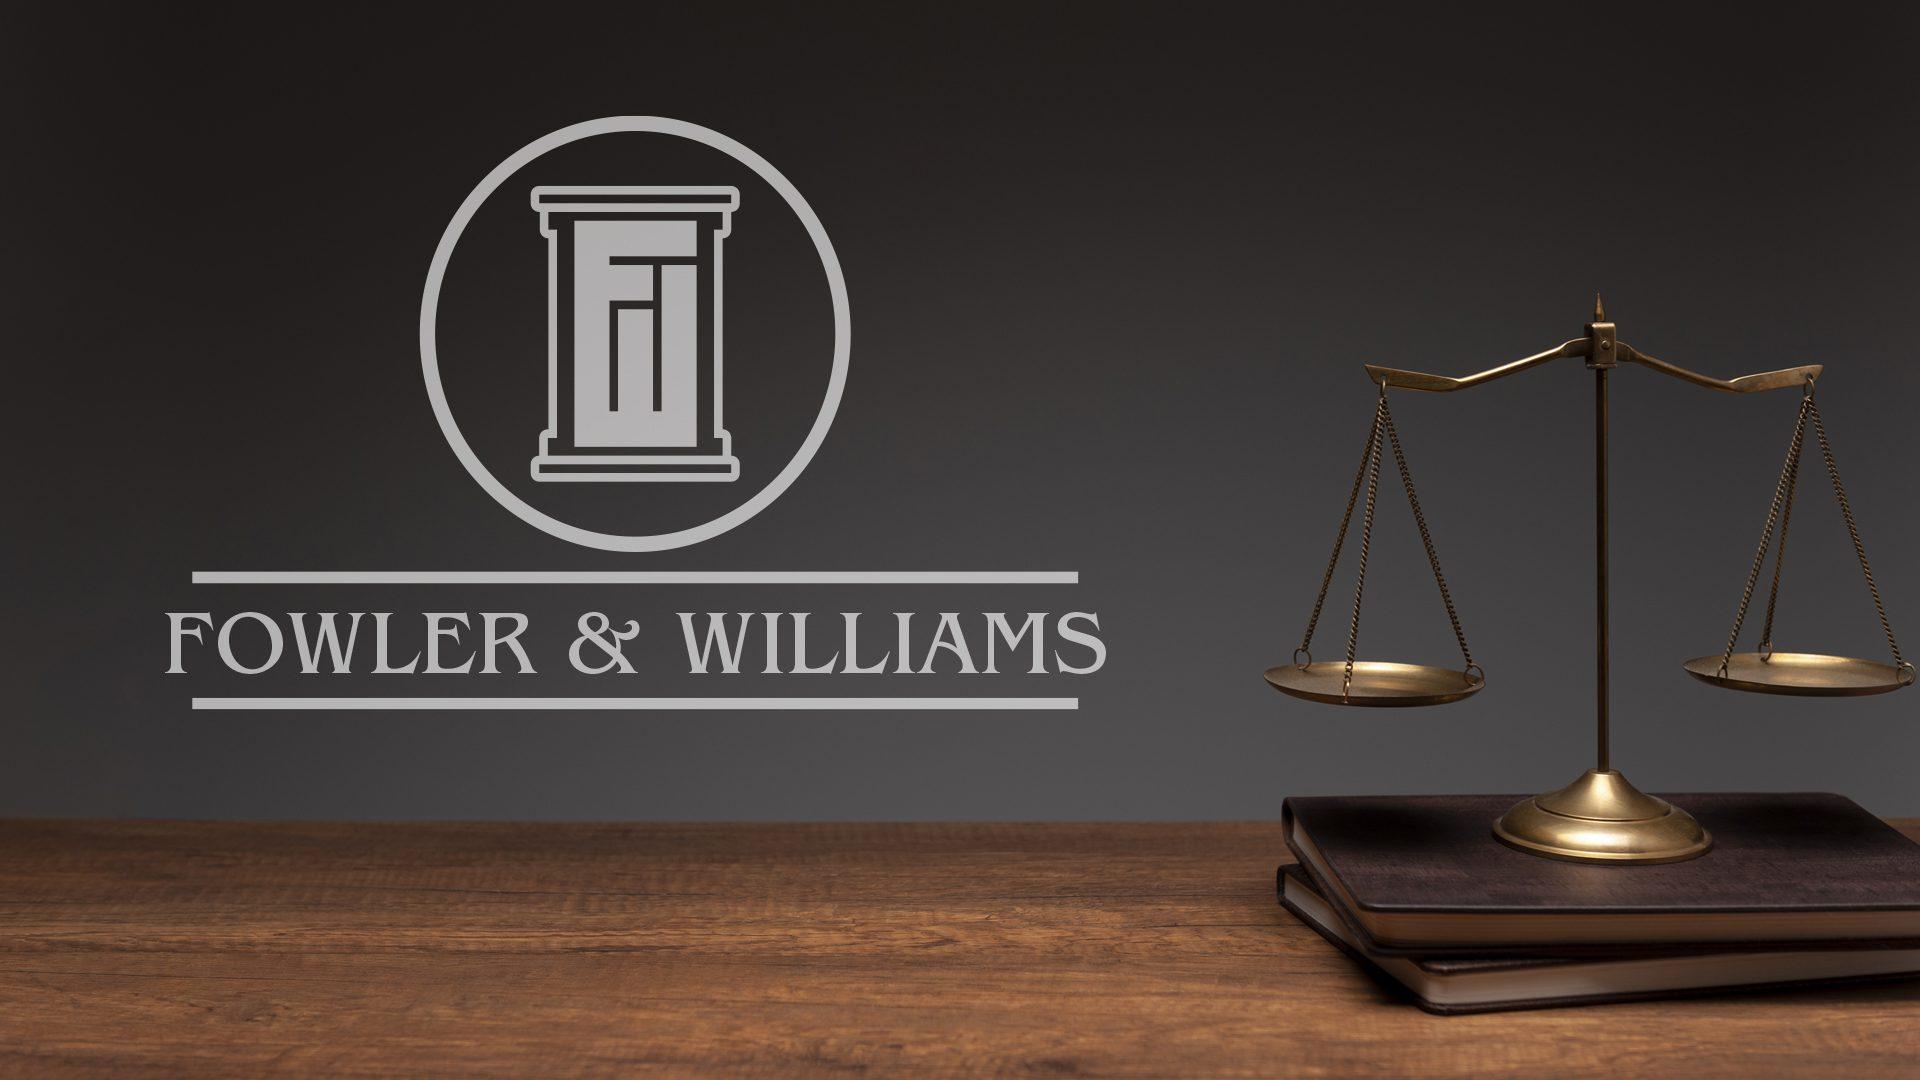 Fowler and Williams - Logo Mockup 03